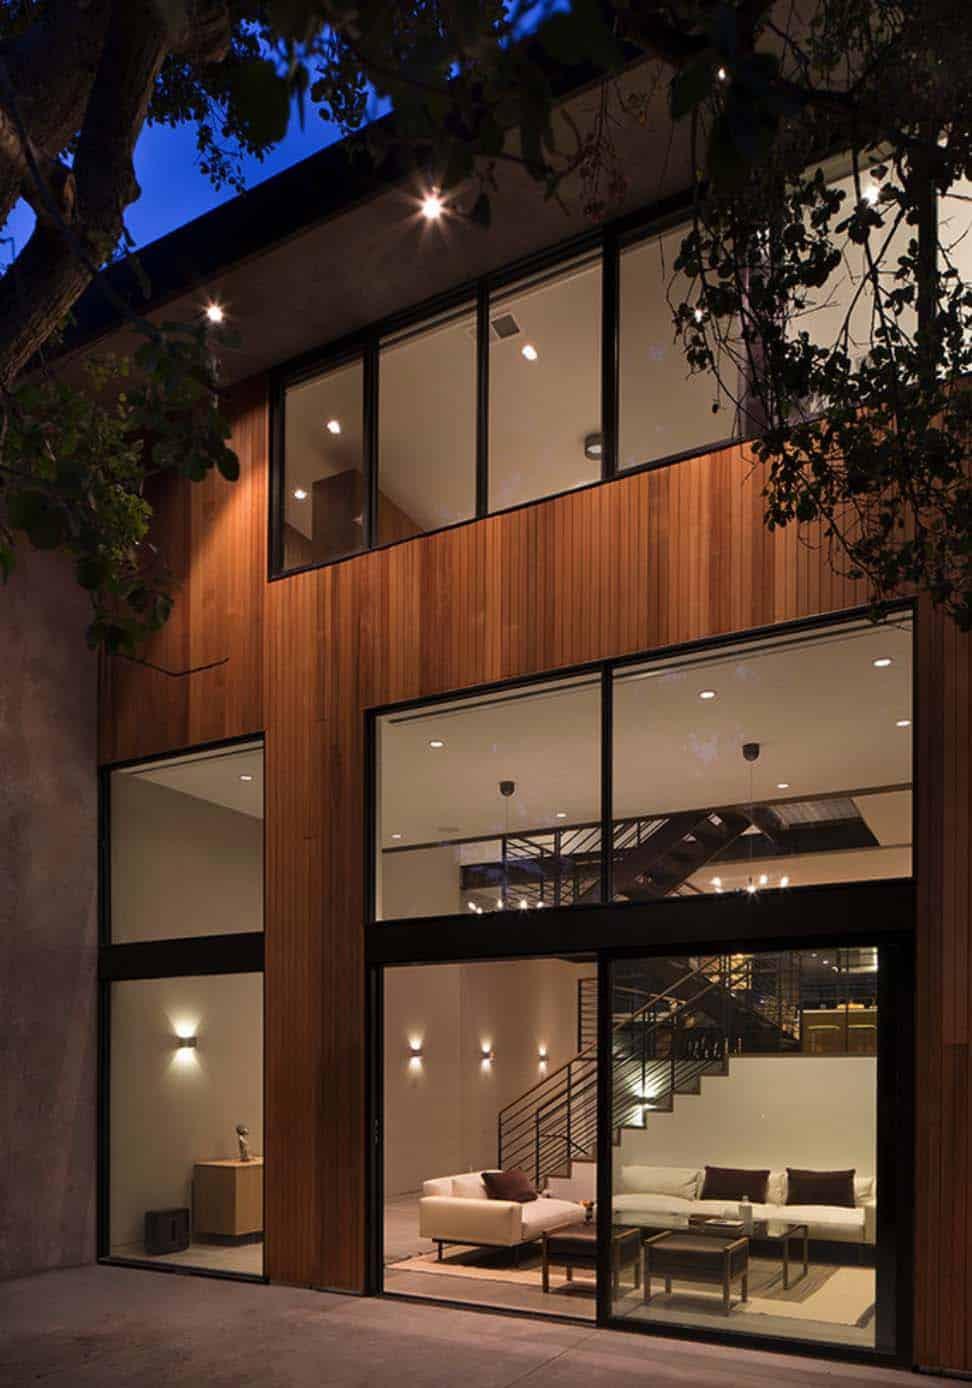 Eichler-Inspired Townhouse-John Lum Architecture-19-1 Kindesign